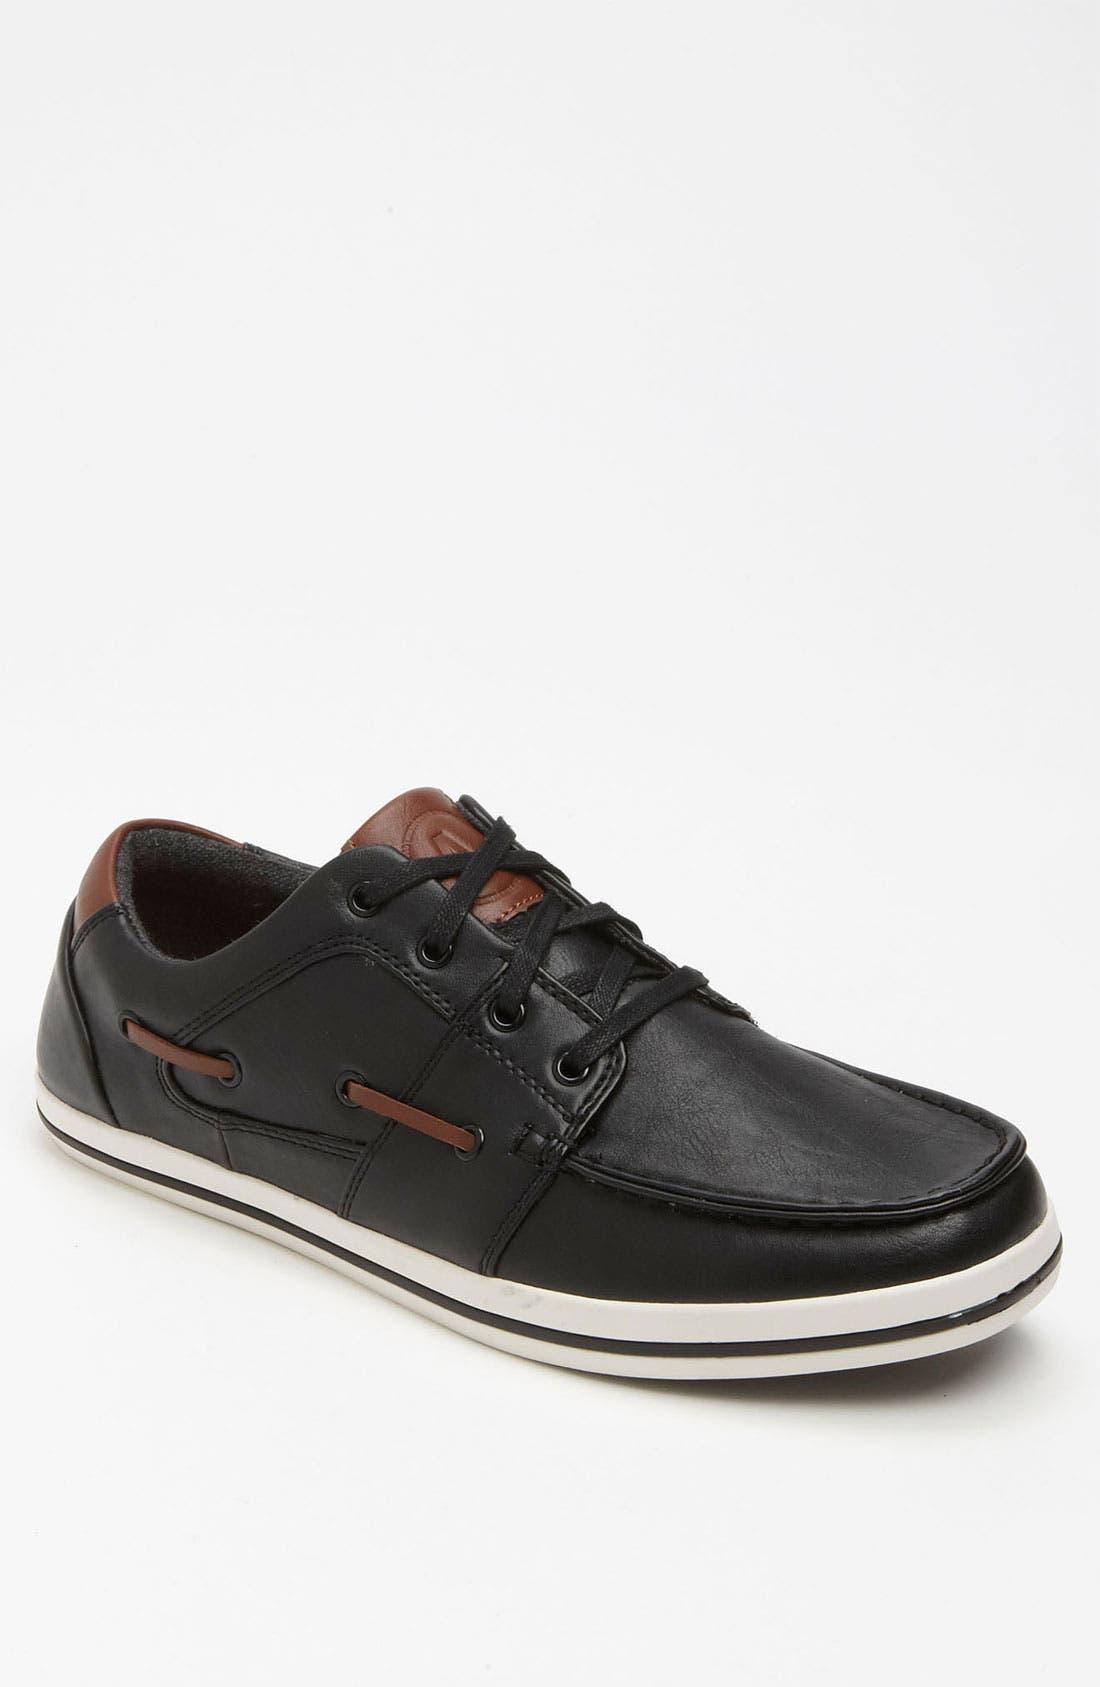 Main Image - ALDO 'Riveroll' Sneaker